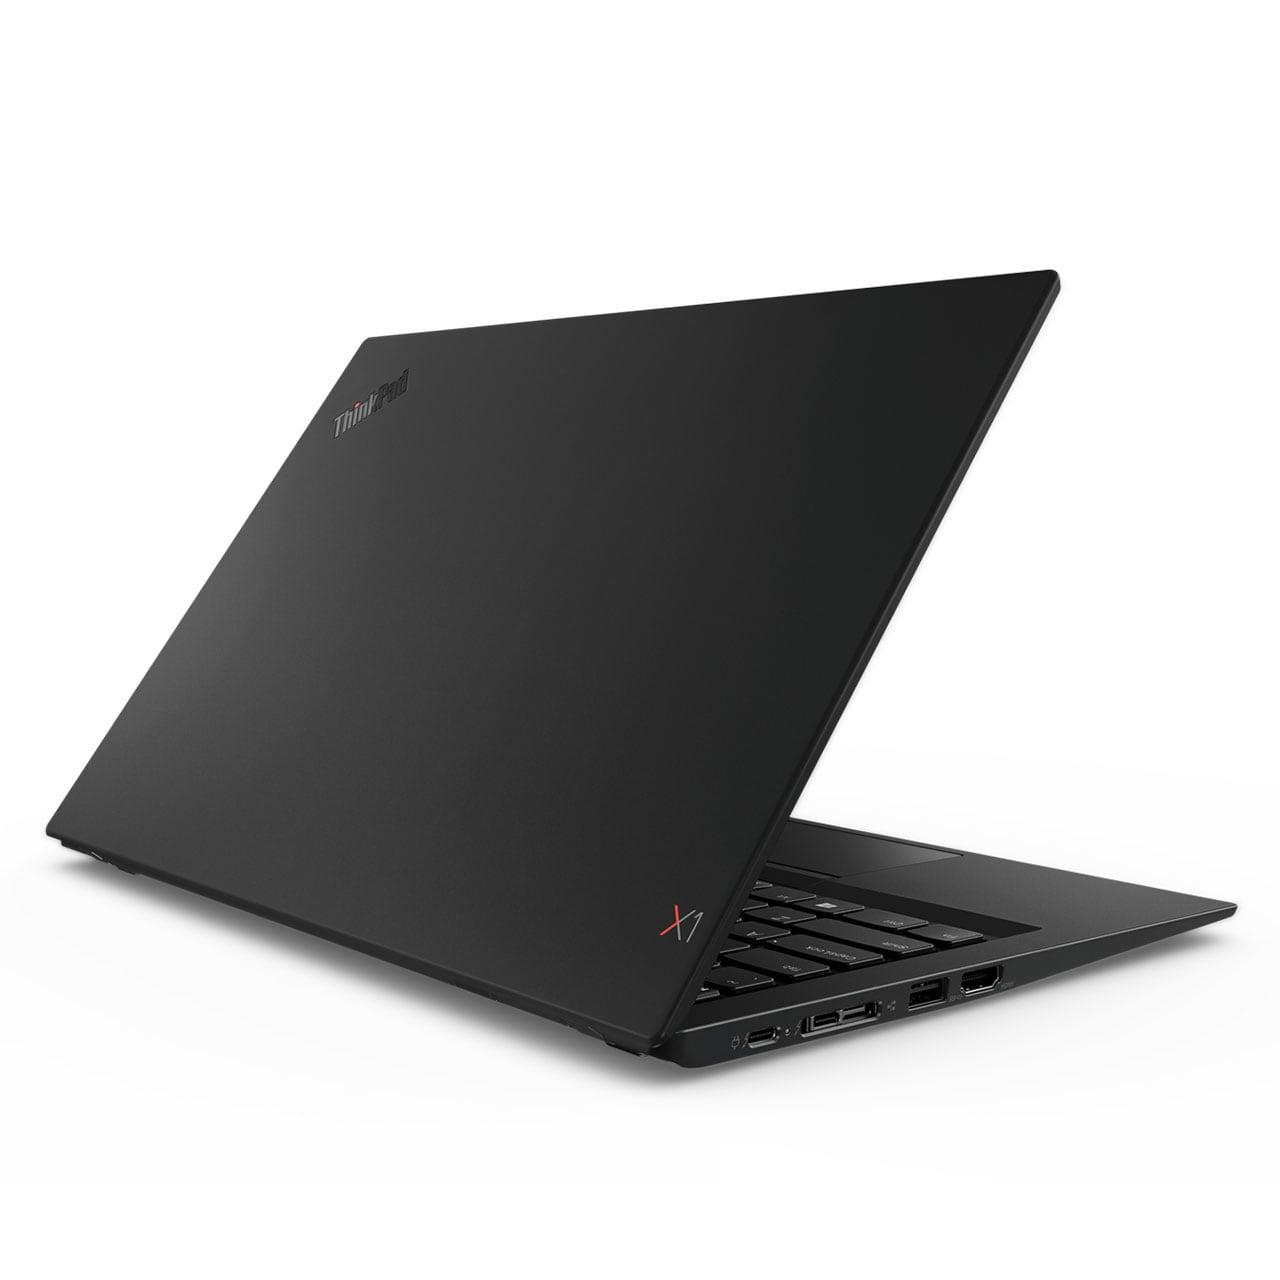 "Lenovo ThinkPad X1 Carbon 6th Generation, 14.0"", i7-8650U, 16 GB RAM, 512GB SSD, Win 10 Pro 64 3"